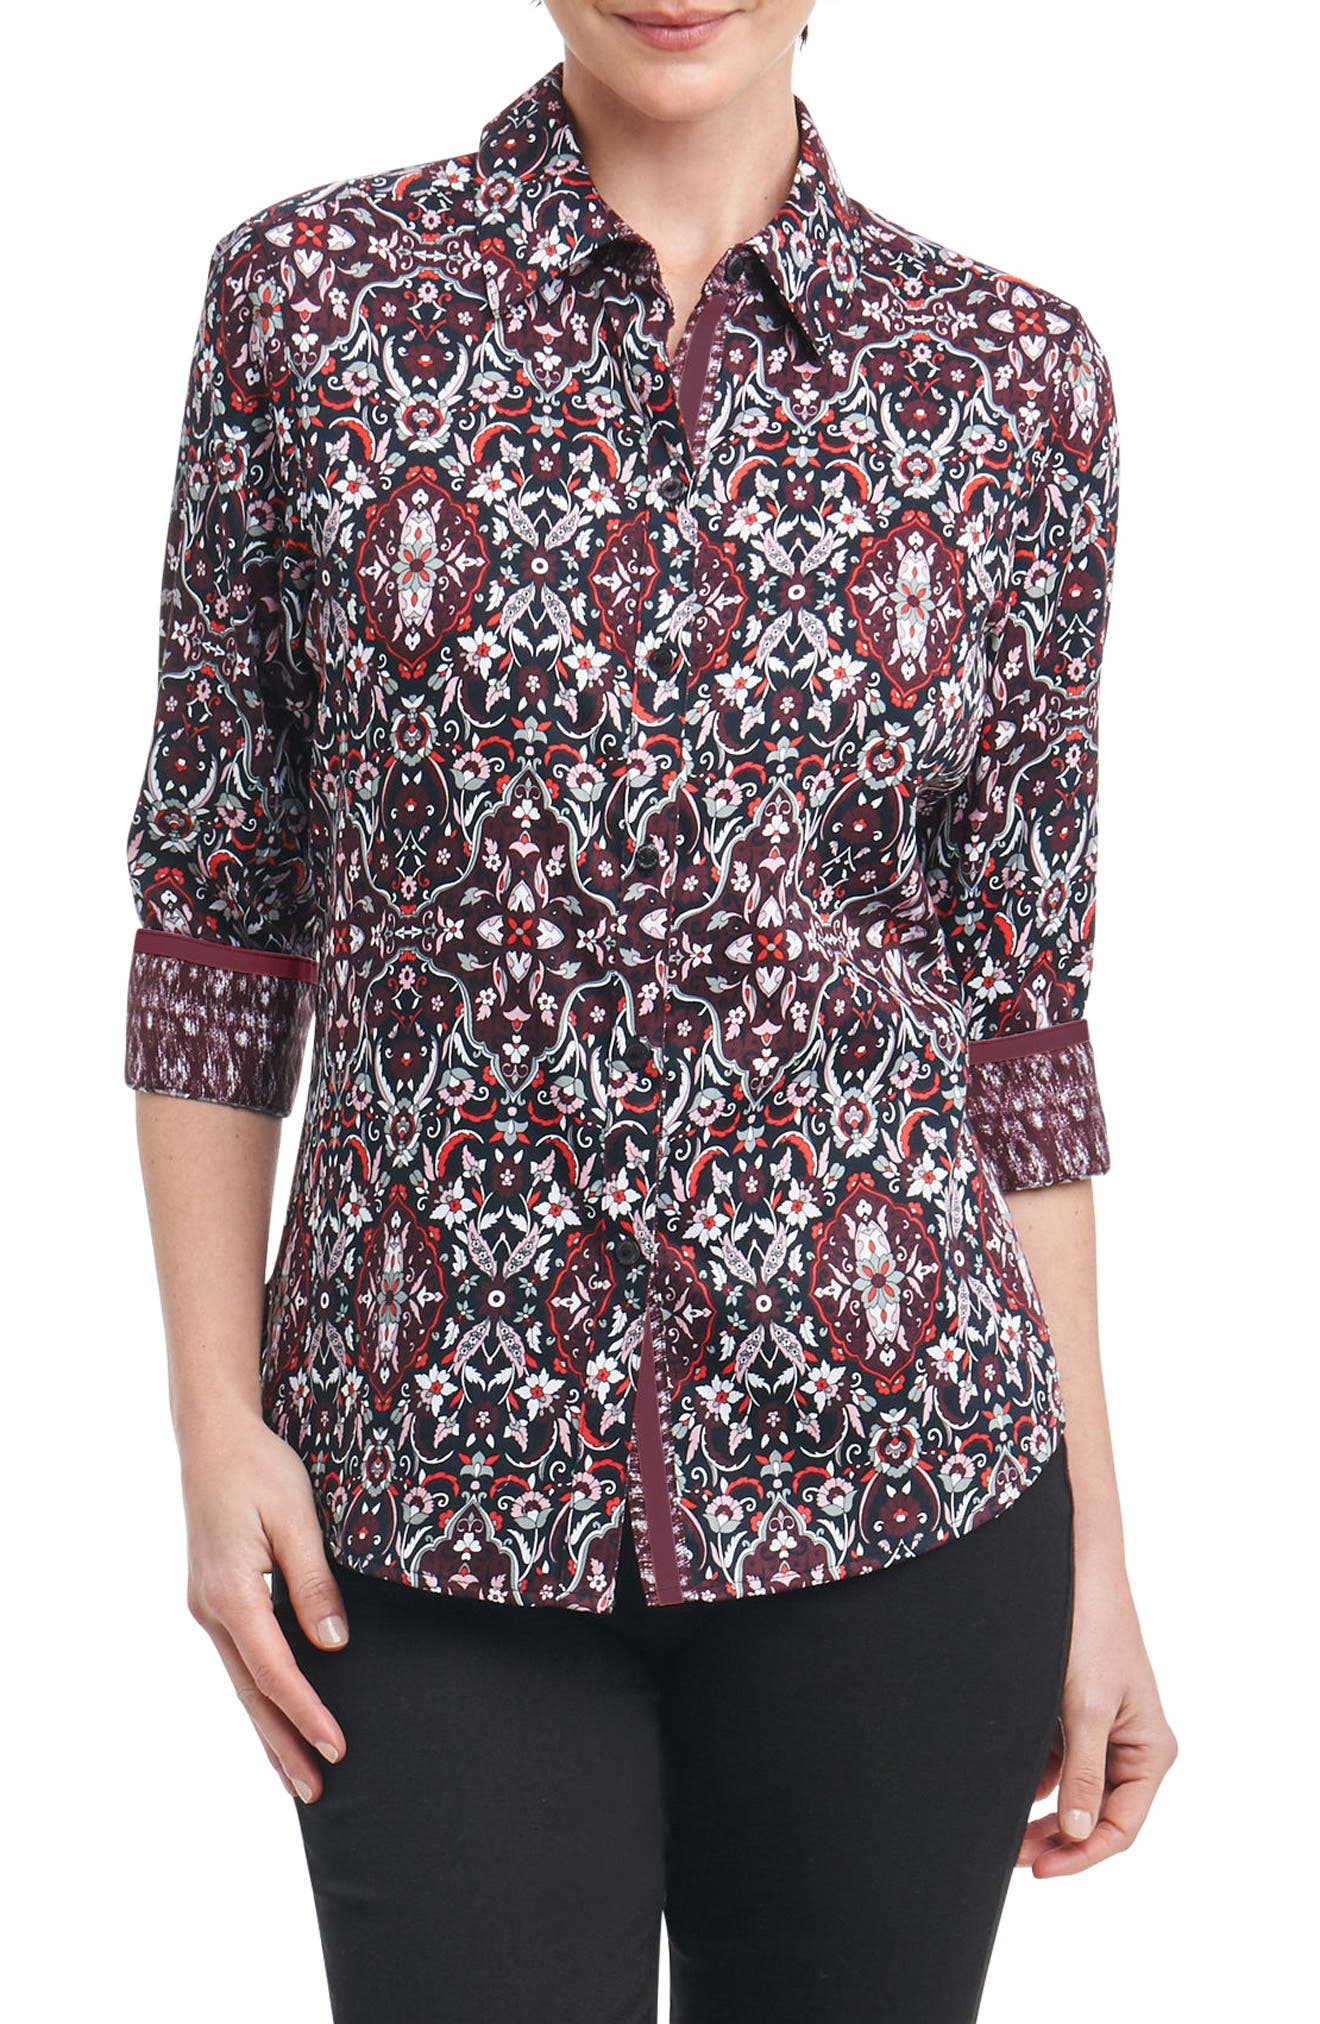 Alternate Image 1 Selected - Foxcroft Ava Heirloom Paisley Shirt (Regular & Petite)